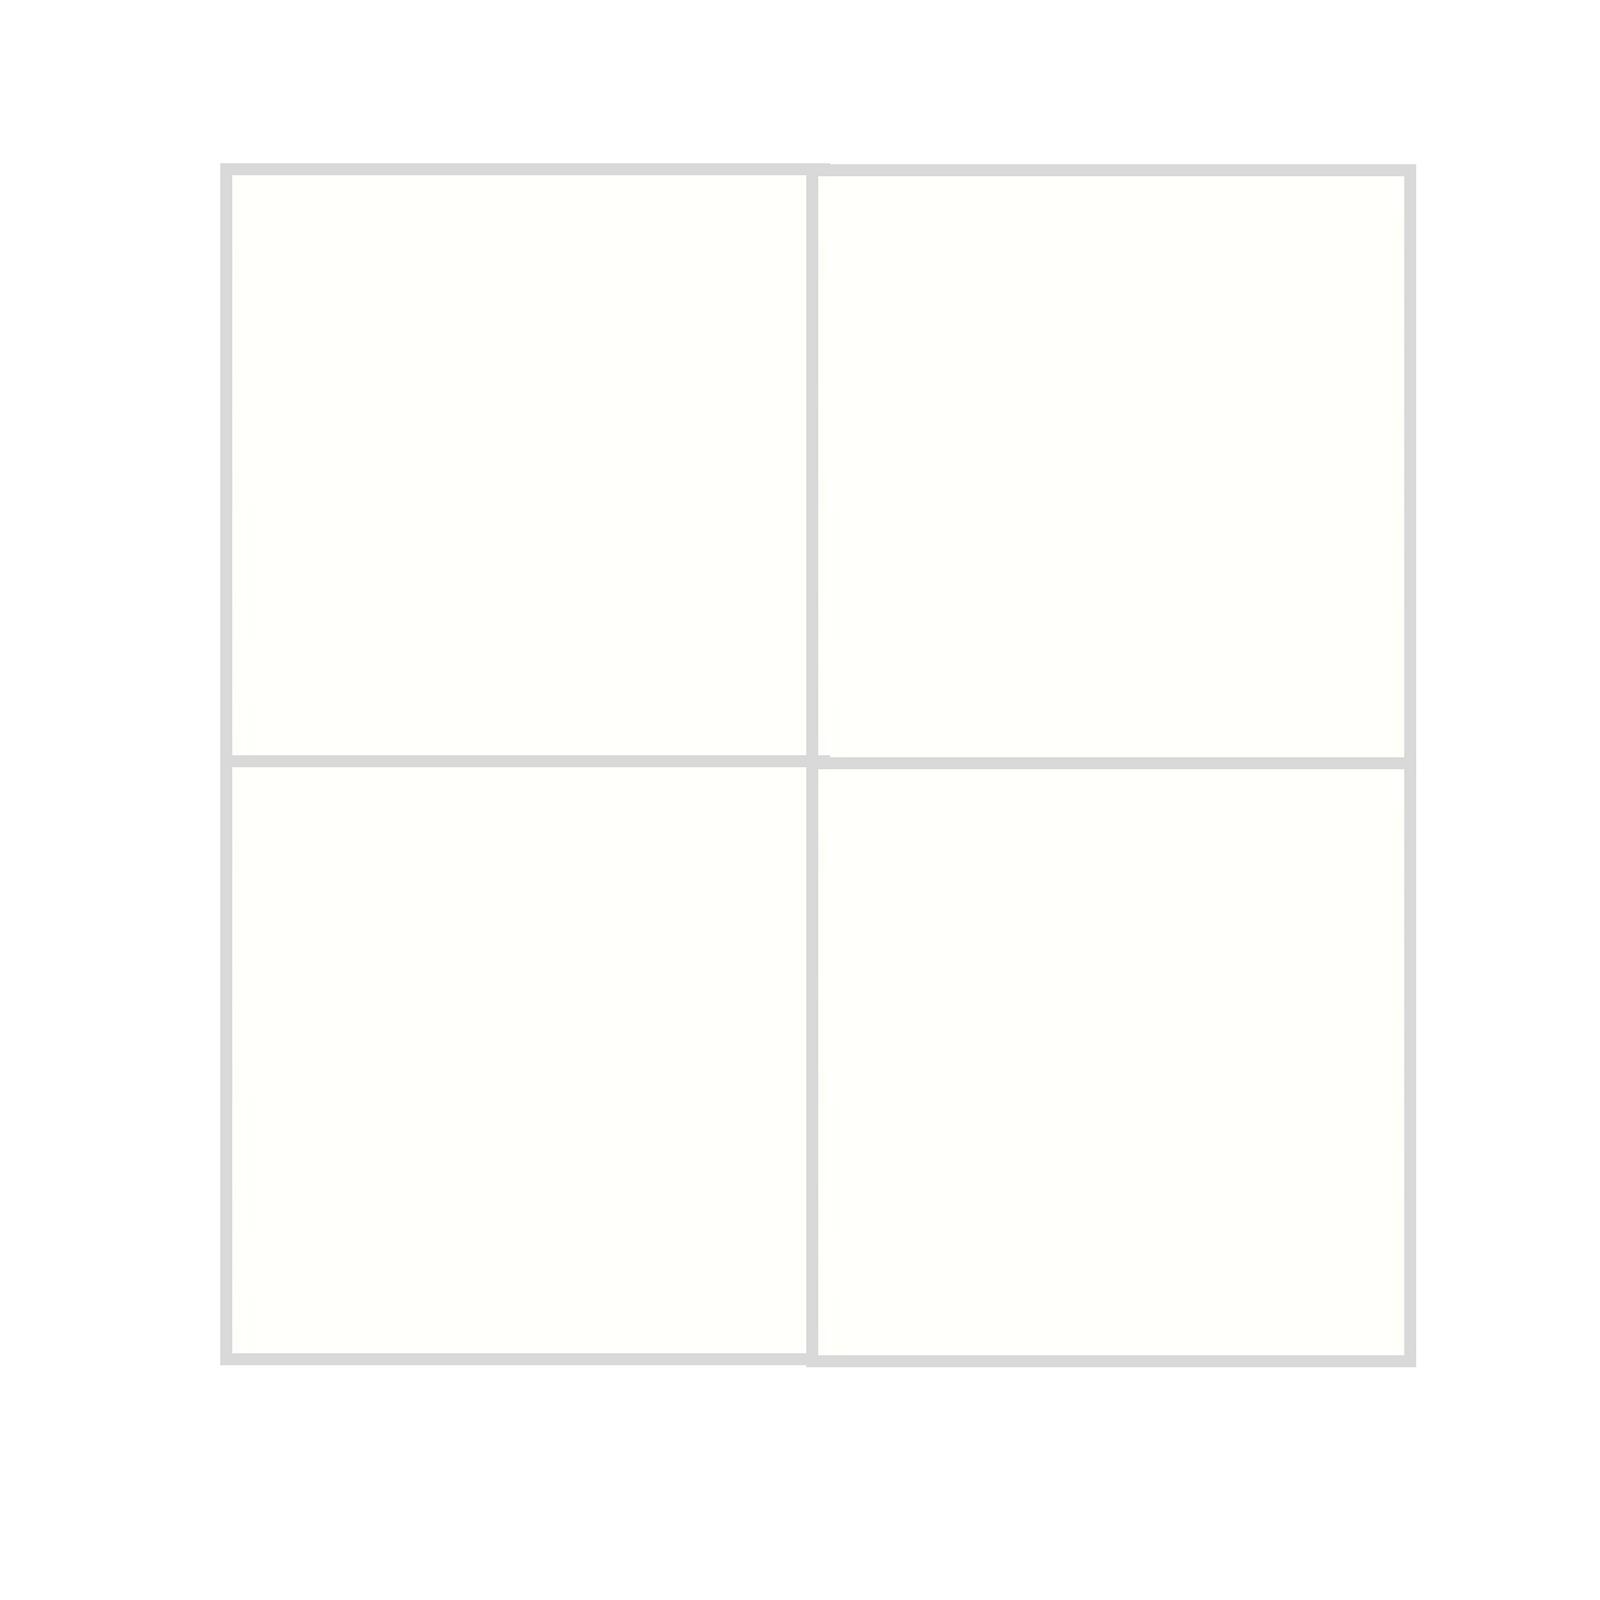 Beyond Tiles 2400 x 620mm x 10mm White Fibo Waterproof Wall Panel